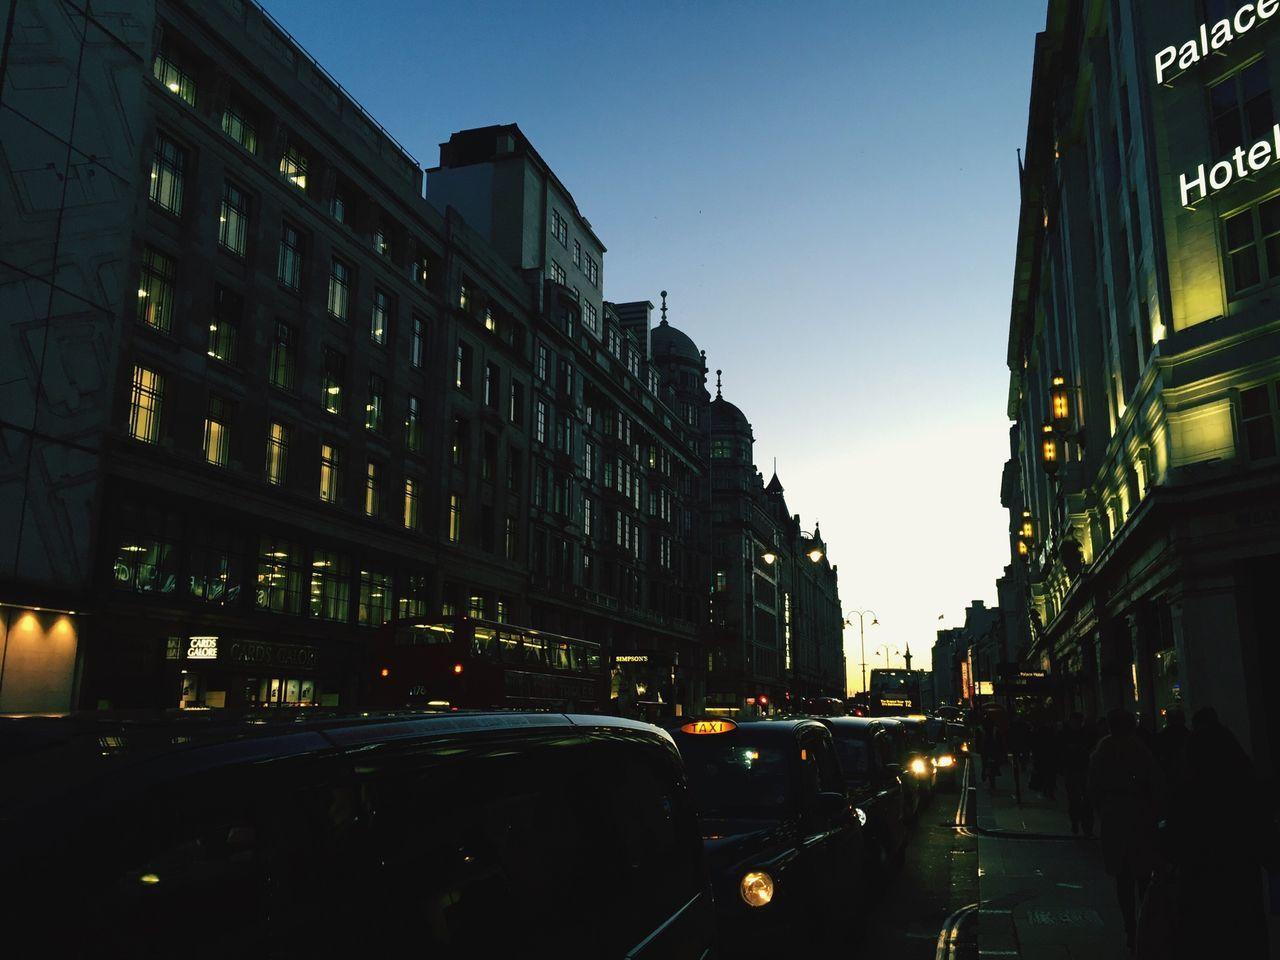 The Strand Taxis Black Cabs Queueing Traffic London Street Evening Sky Evening Light Window Light Blue Wave